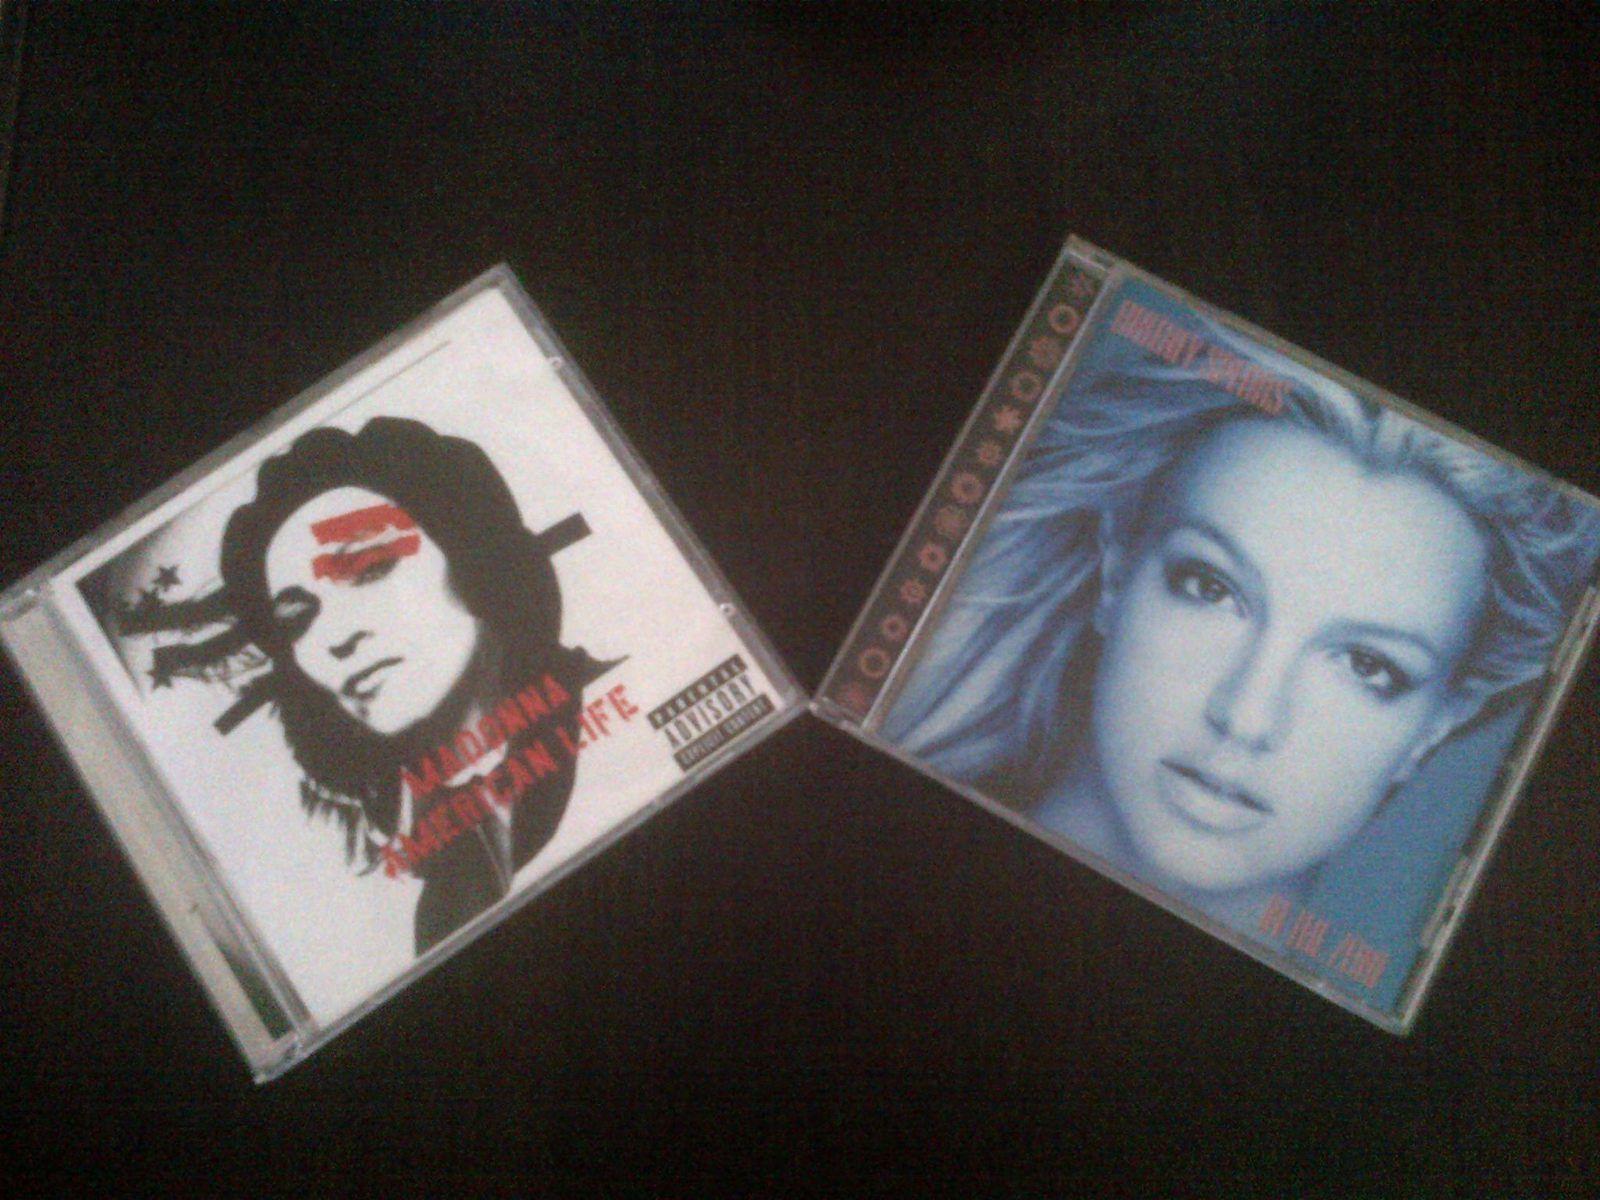 Mes 2 albums favori!